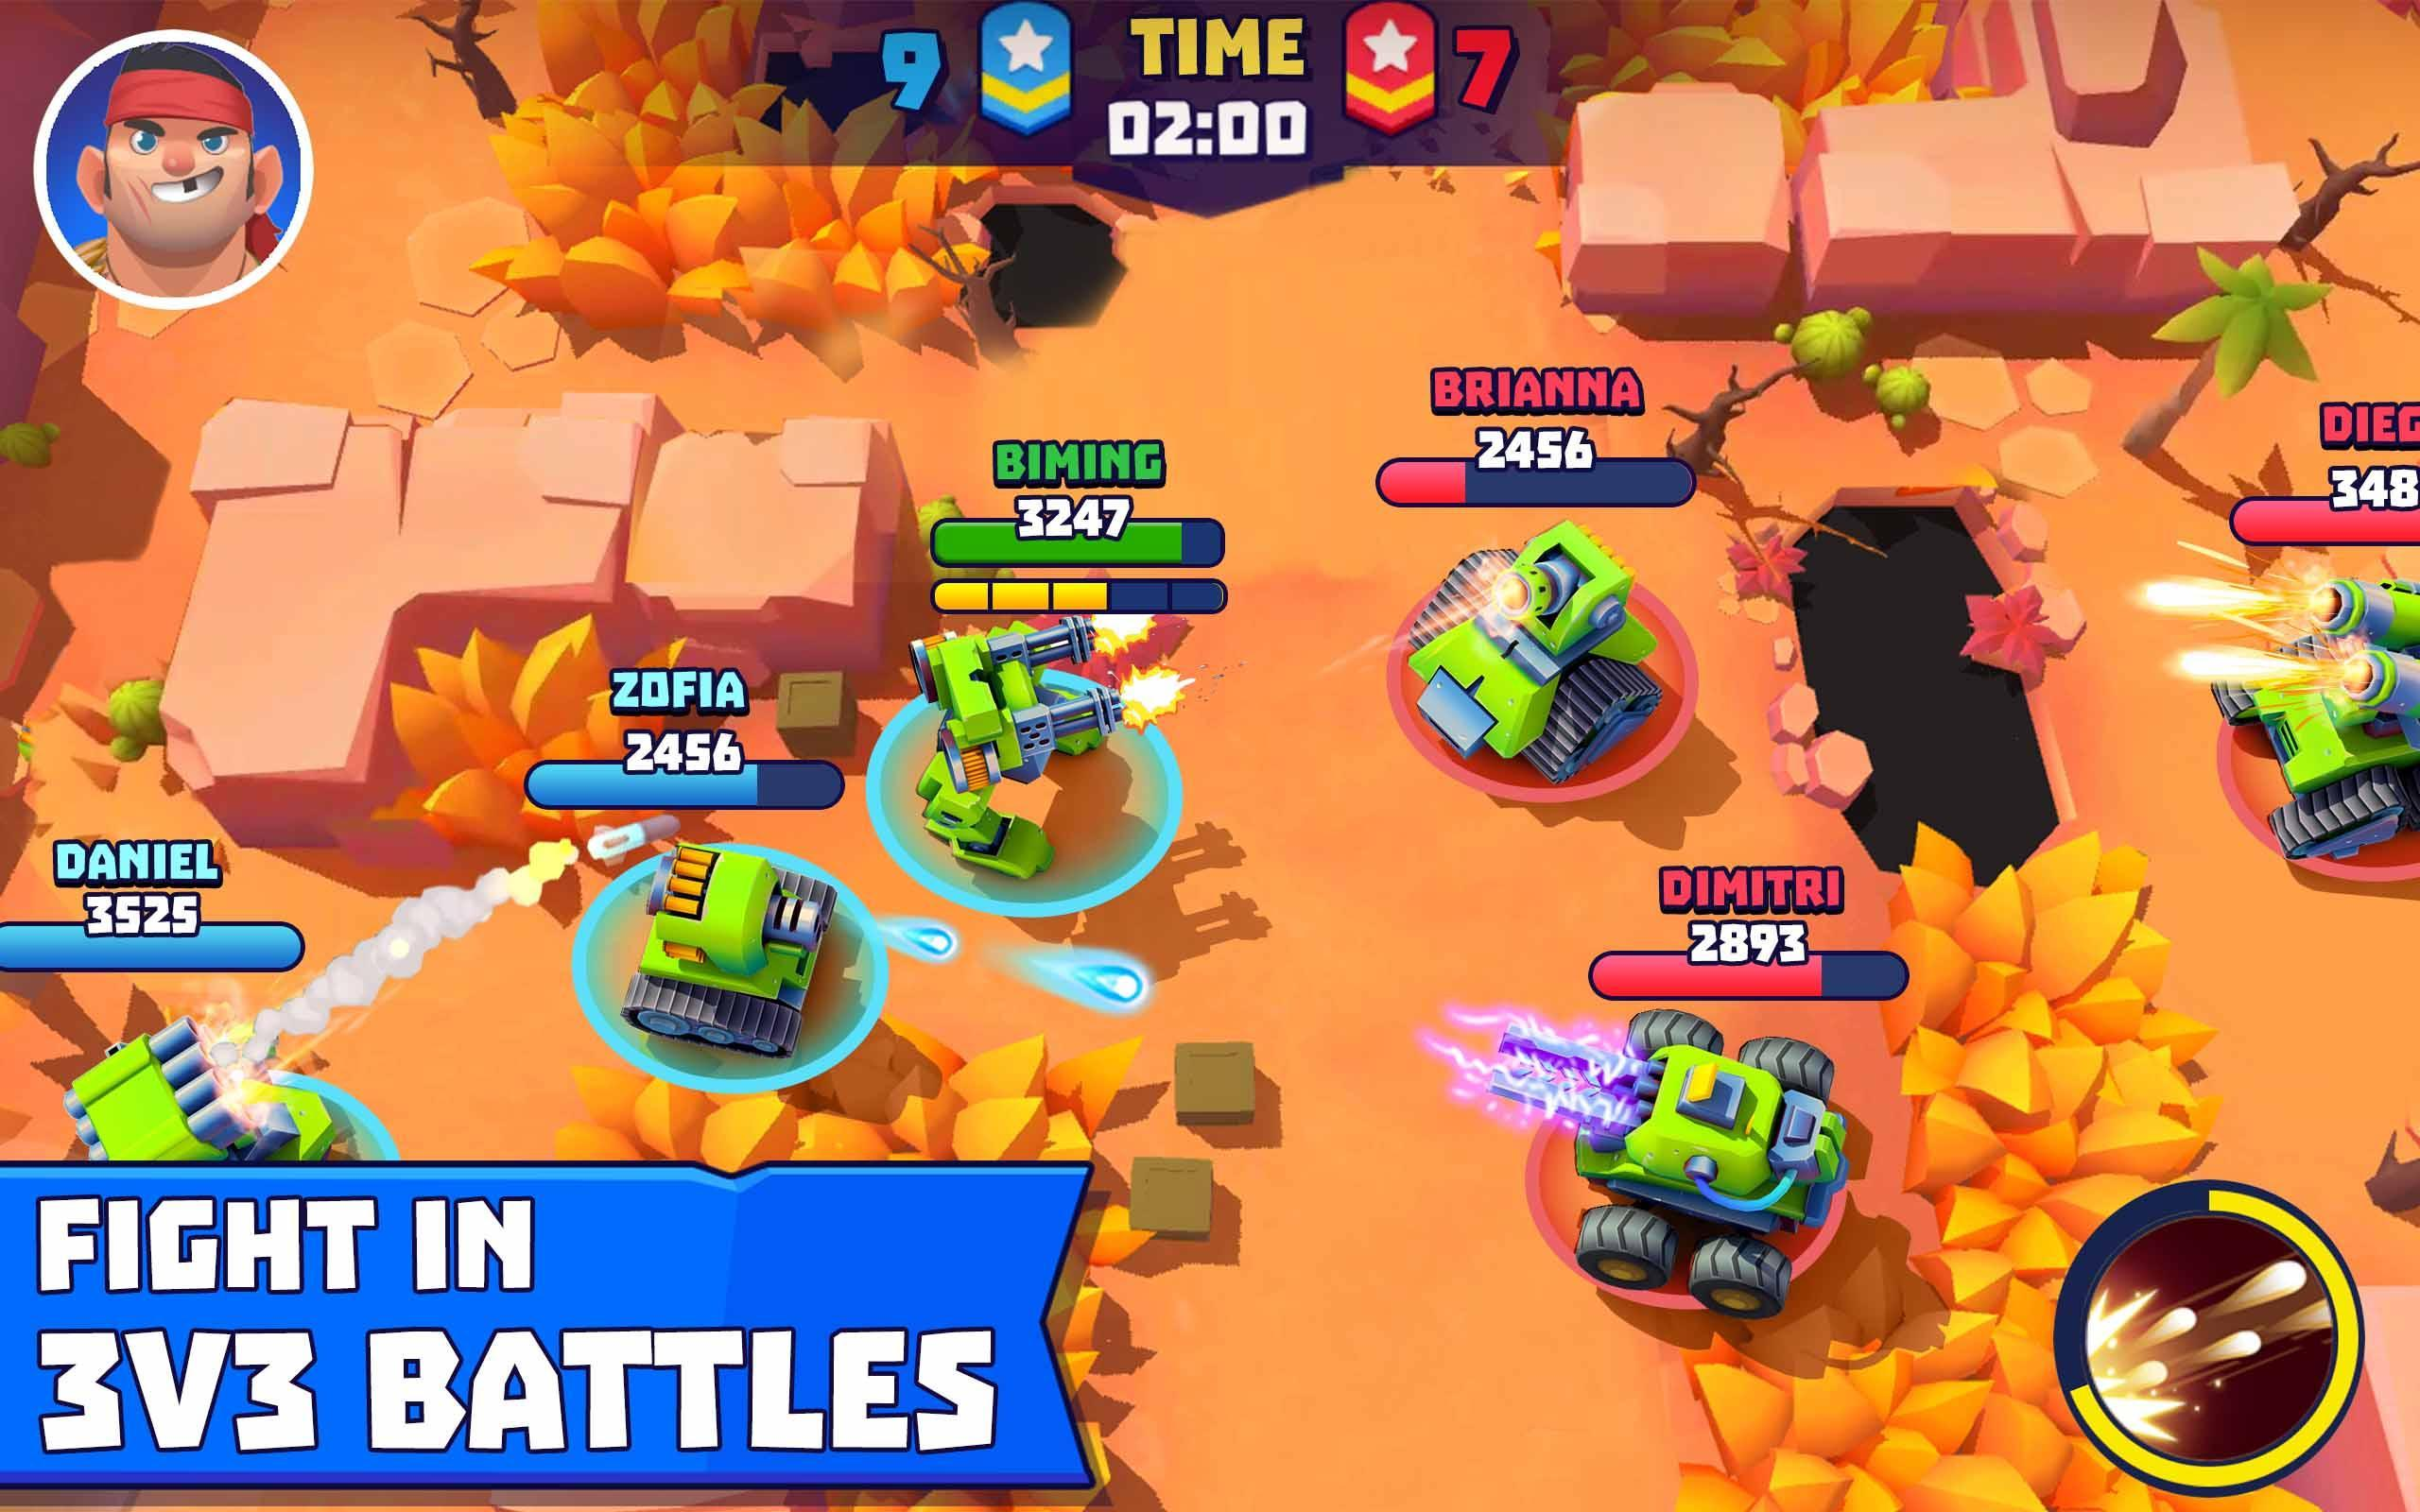 Tanks A Lot! - Realtime Multiplayer Battle Arena 2.56 Screenshot 17